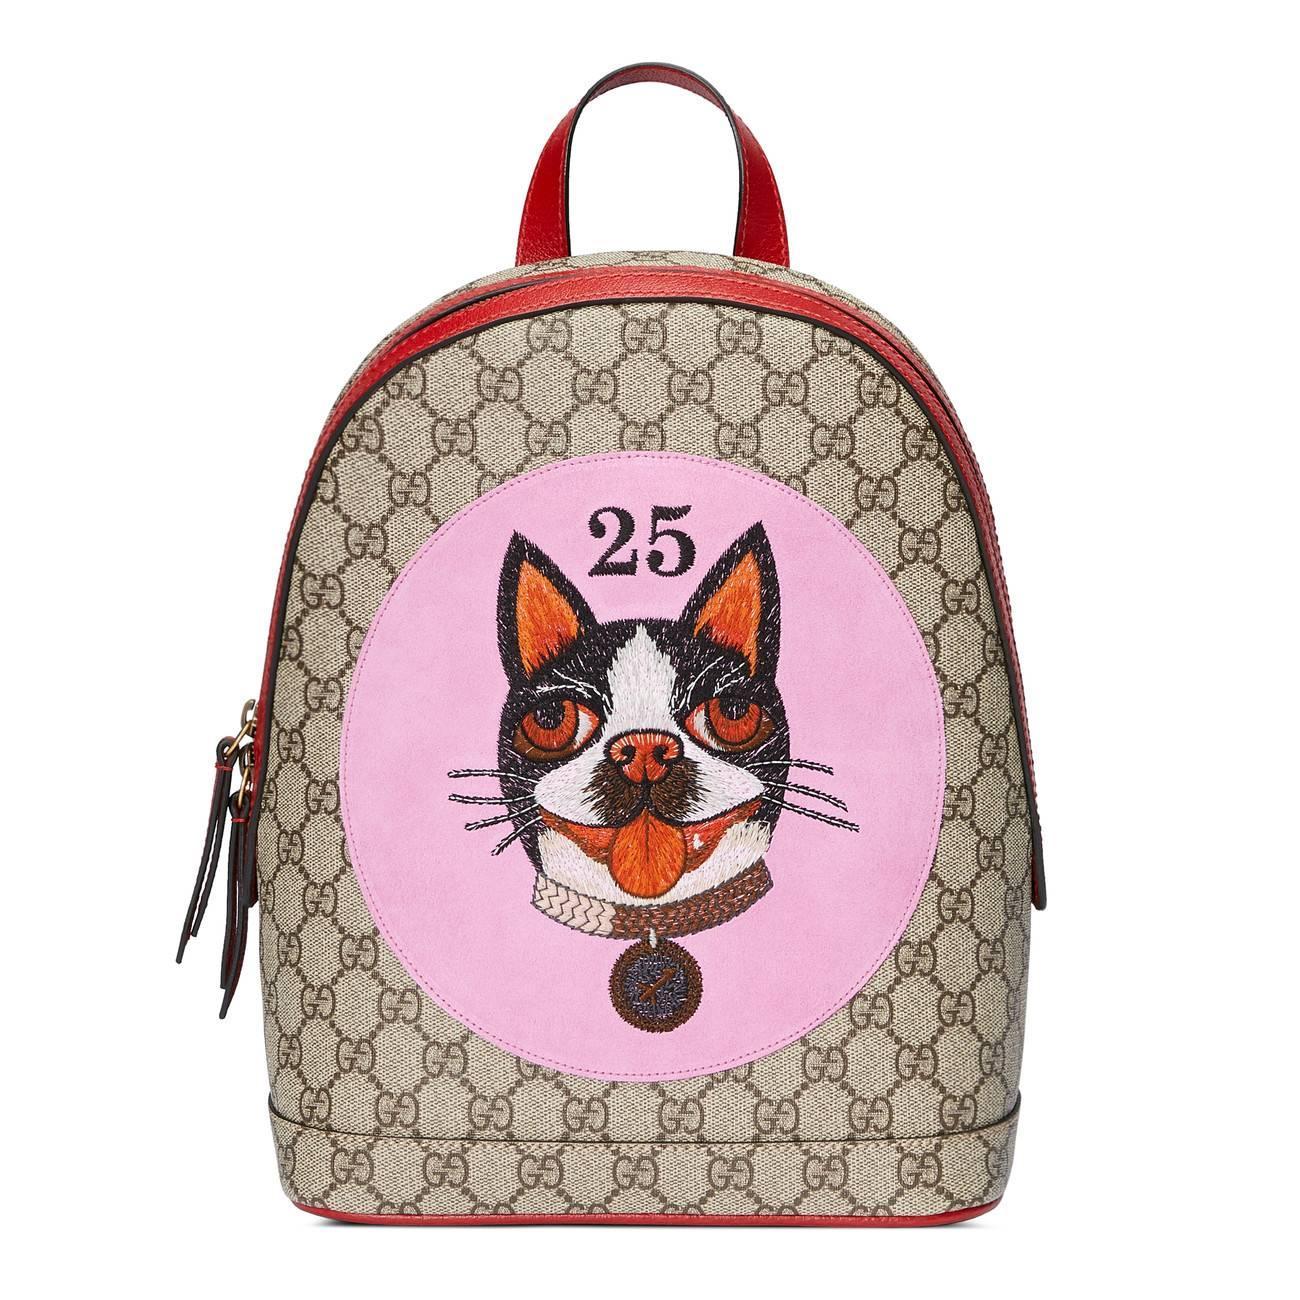 2064962f24f Lyst - Gucci GG Supreme Bosco Backpack Beige in Natural